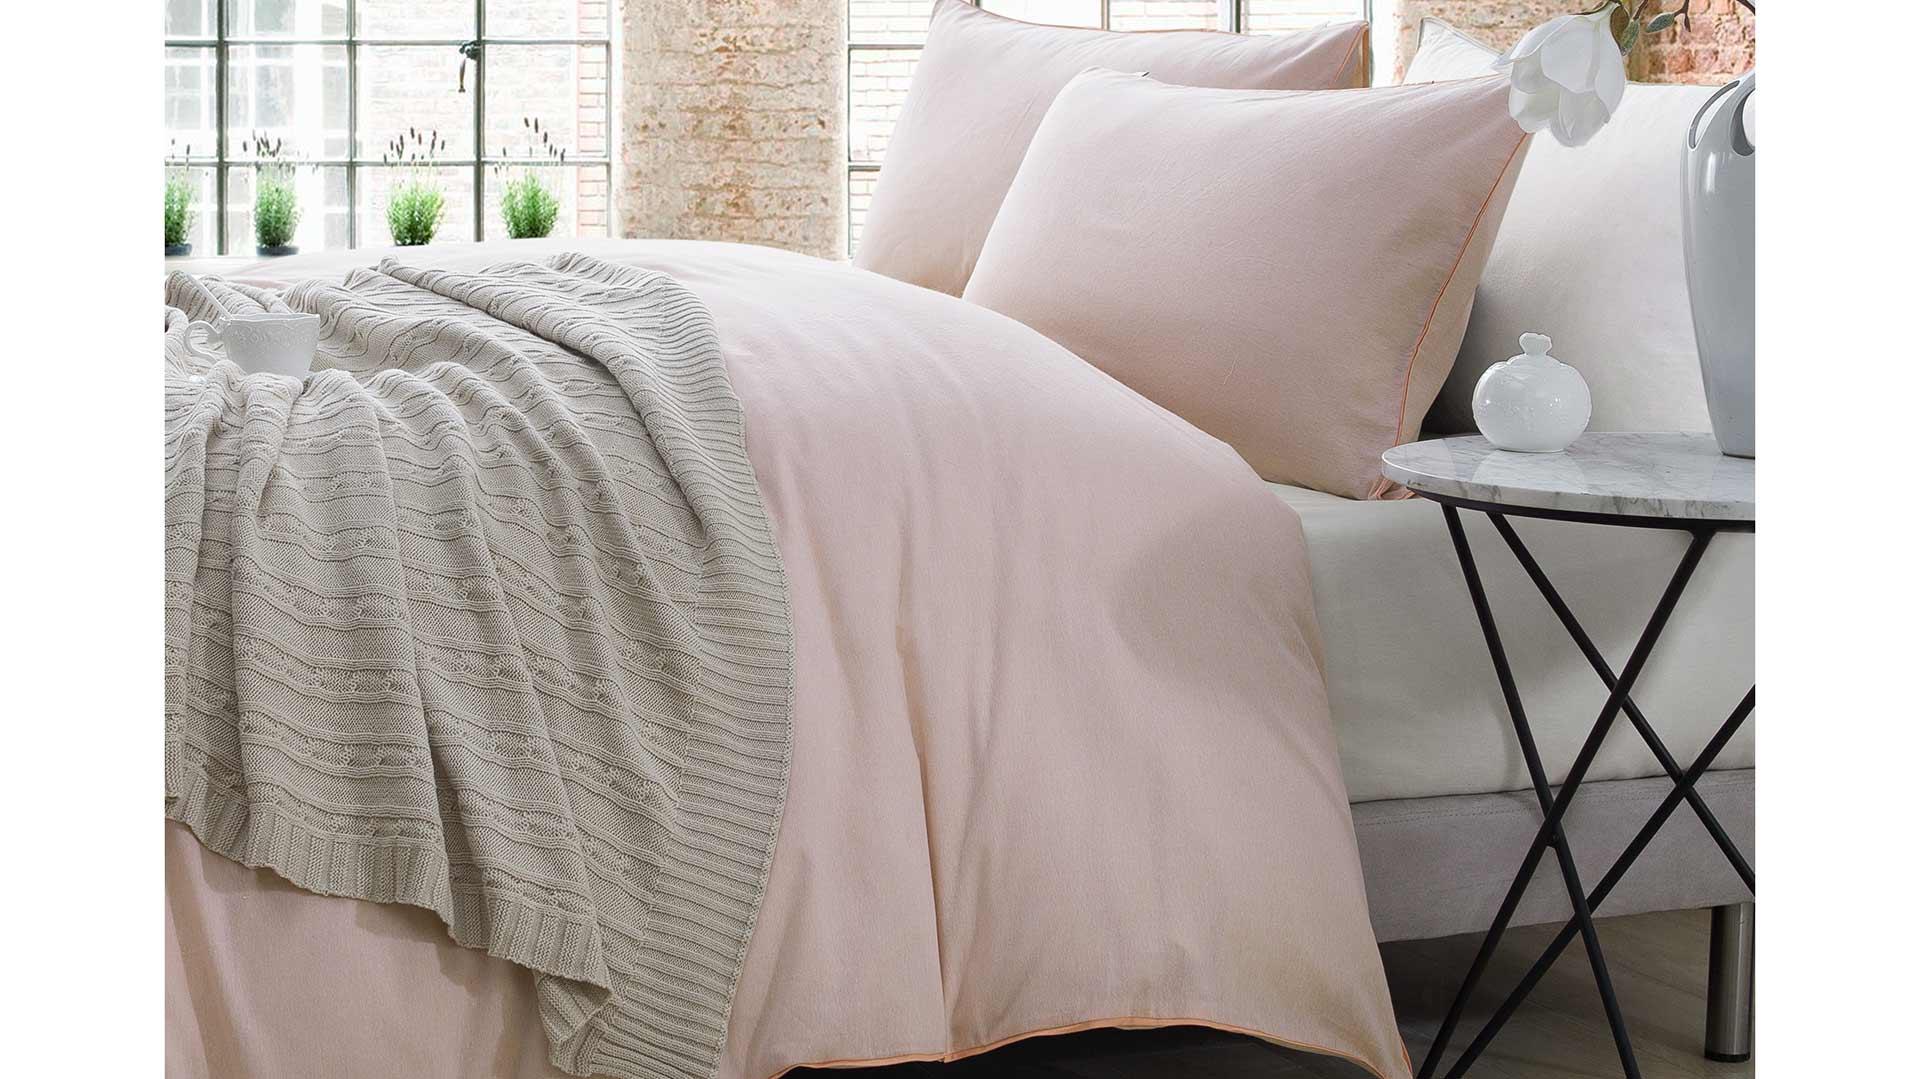 Chambray Cotton Bedding Grey Ecru Or Peach Natural Bed Company